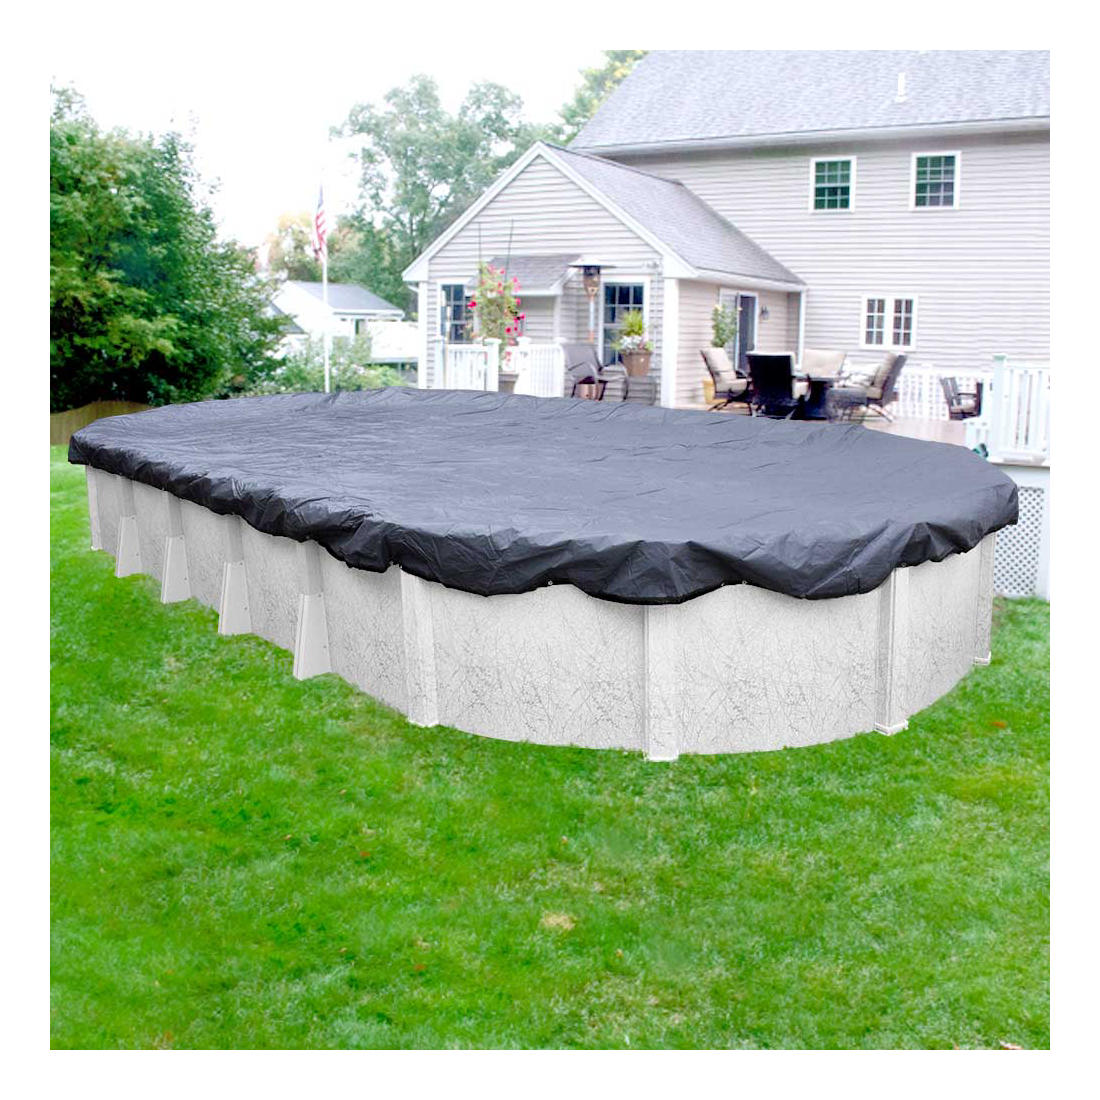 Robelle Premier 12\' x 24\' Oval Aboveground Pool Winter Cover - Slate  Blue/Black